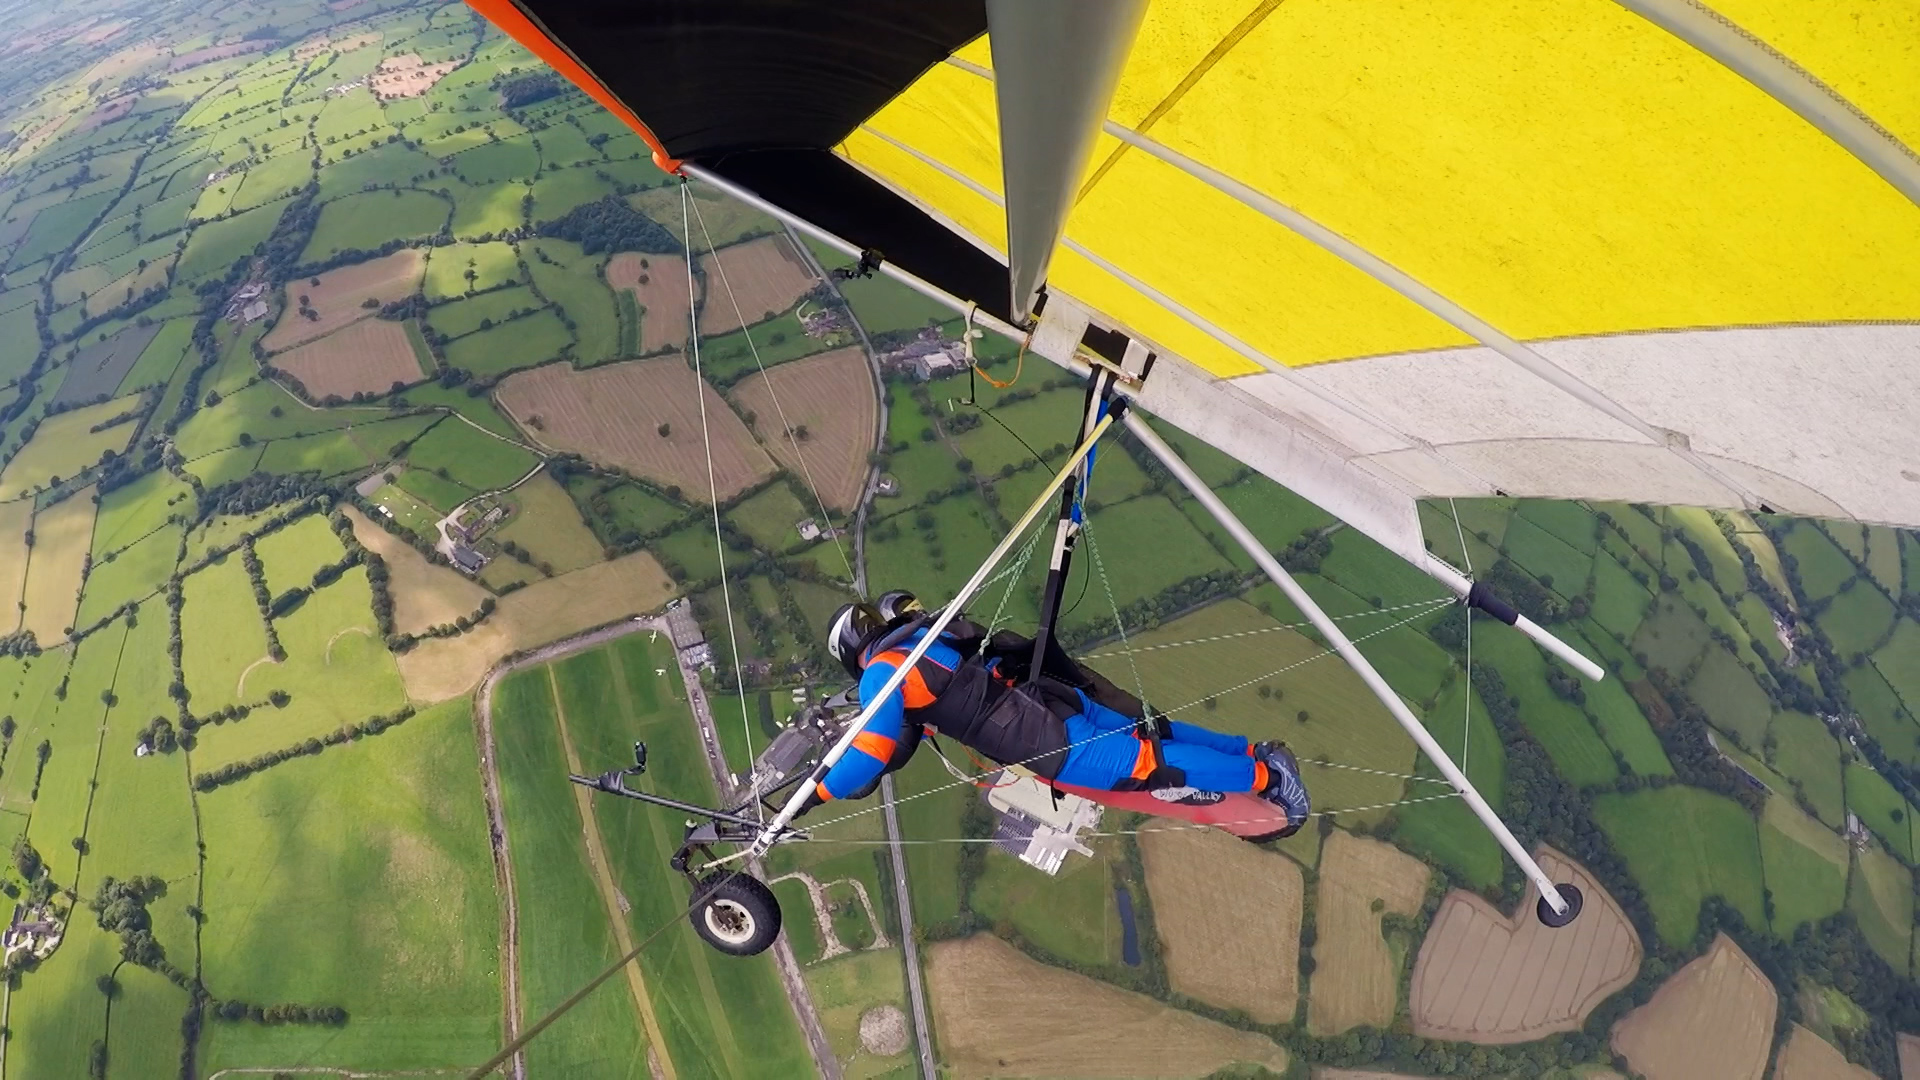 CBBC Beyond Bionic - Andy Torbet paragliding